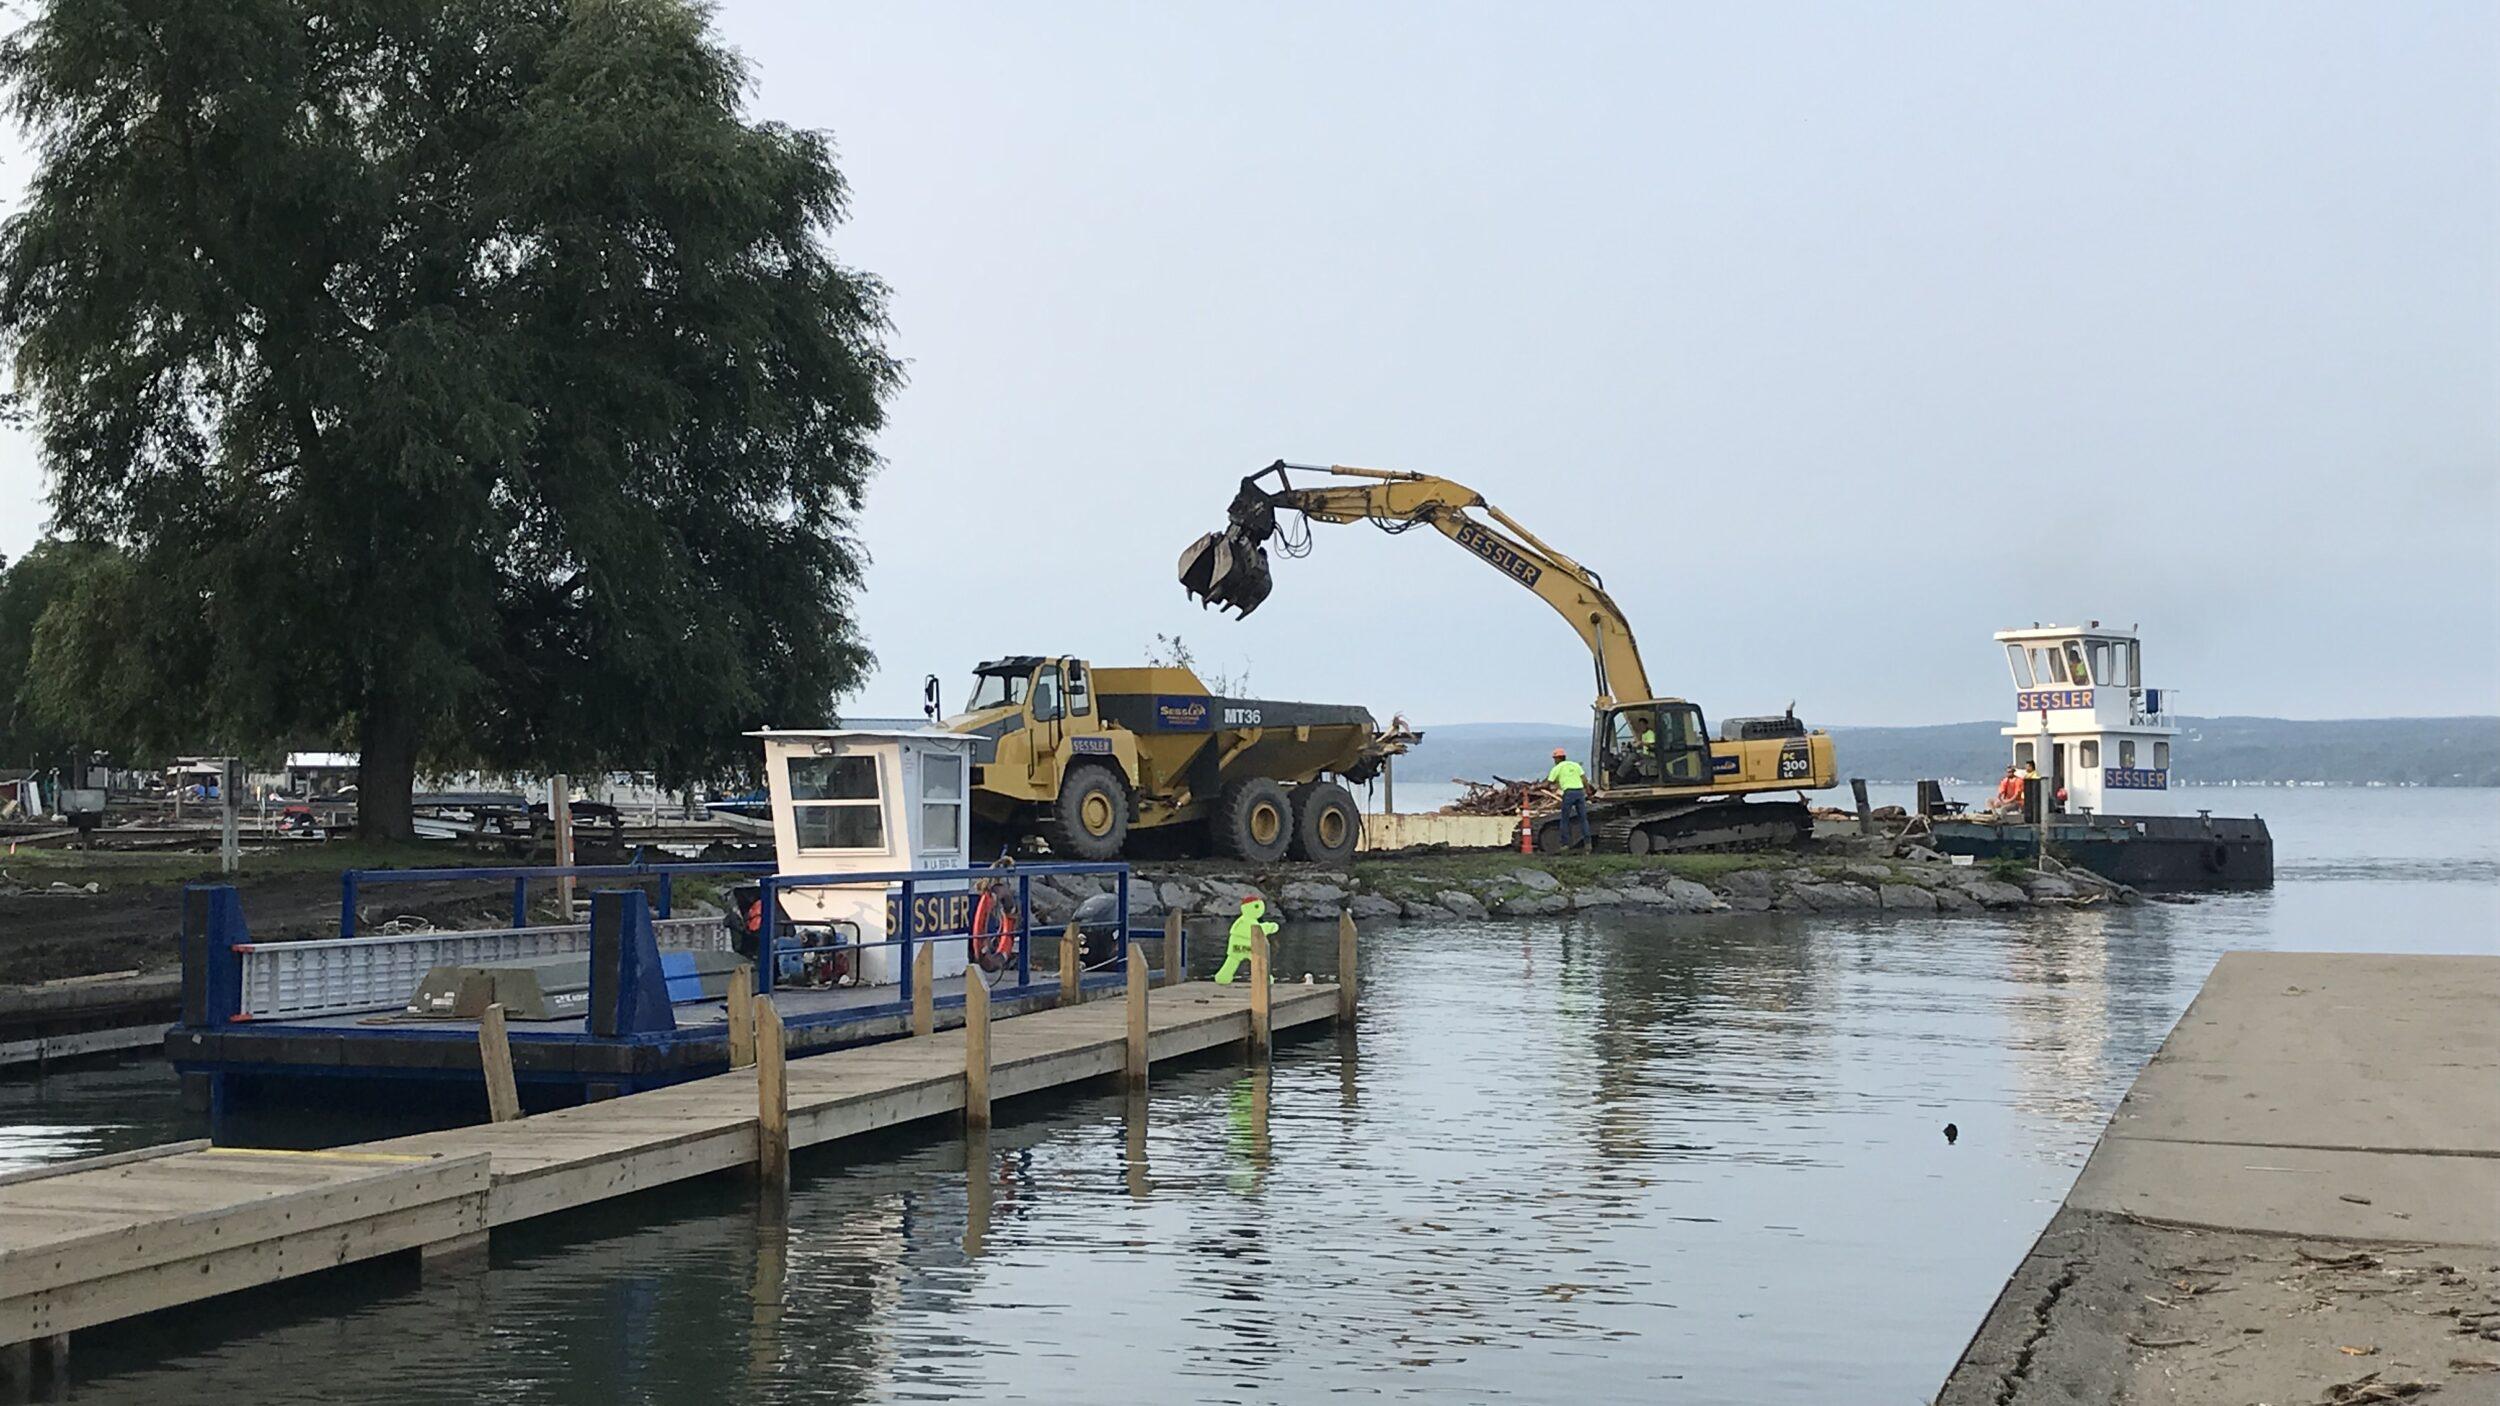 Excavator by lake